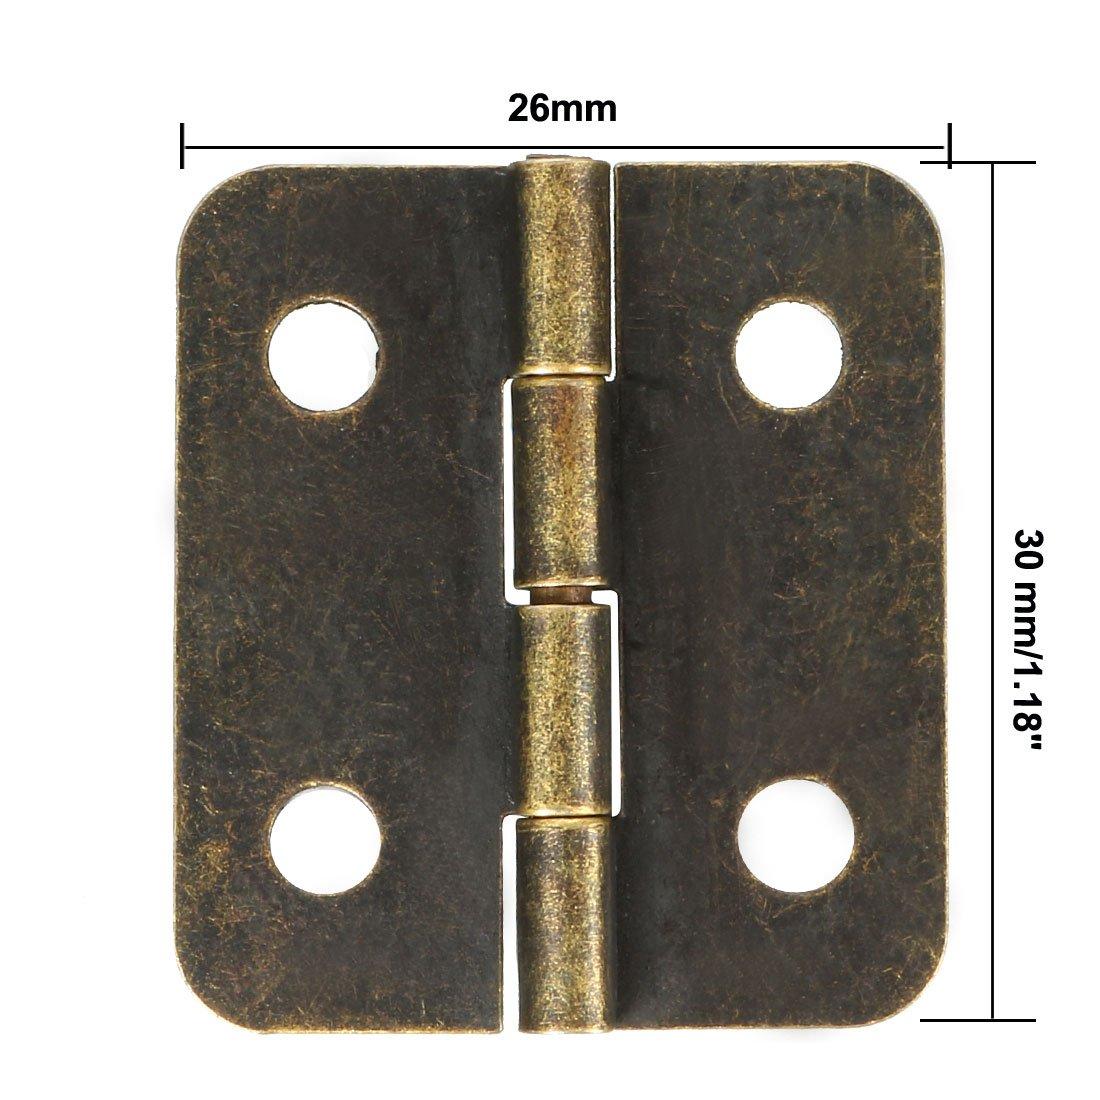 uxcell Bisagras de bronce antiguo de 3 pulgadas con tornillos 10 unidades